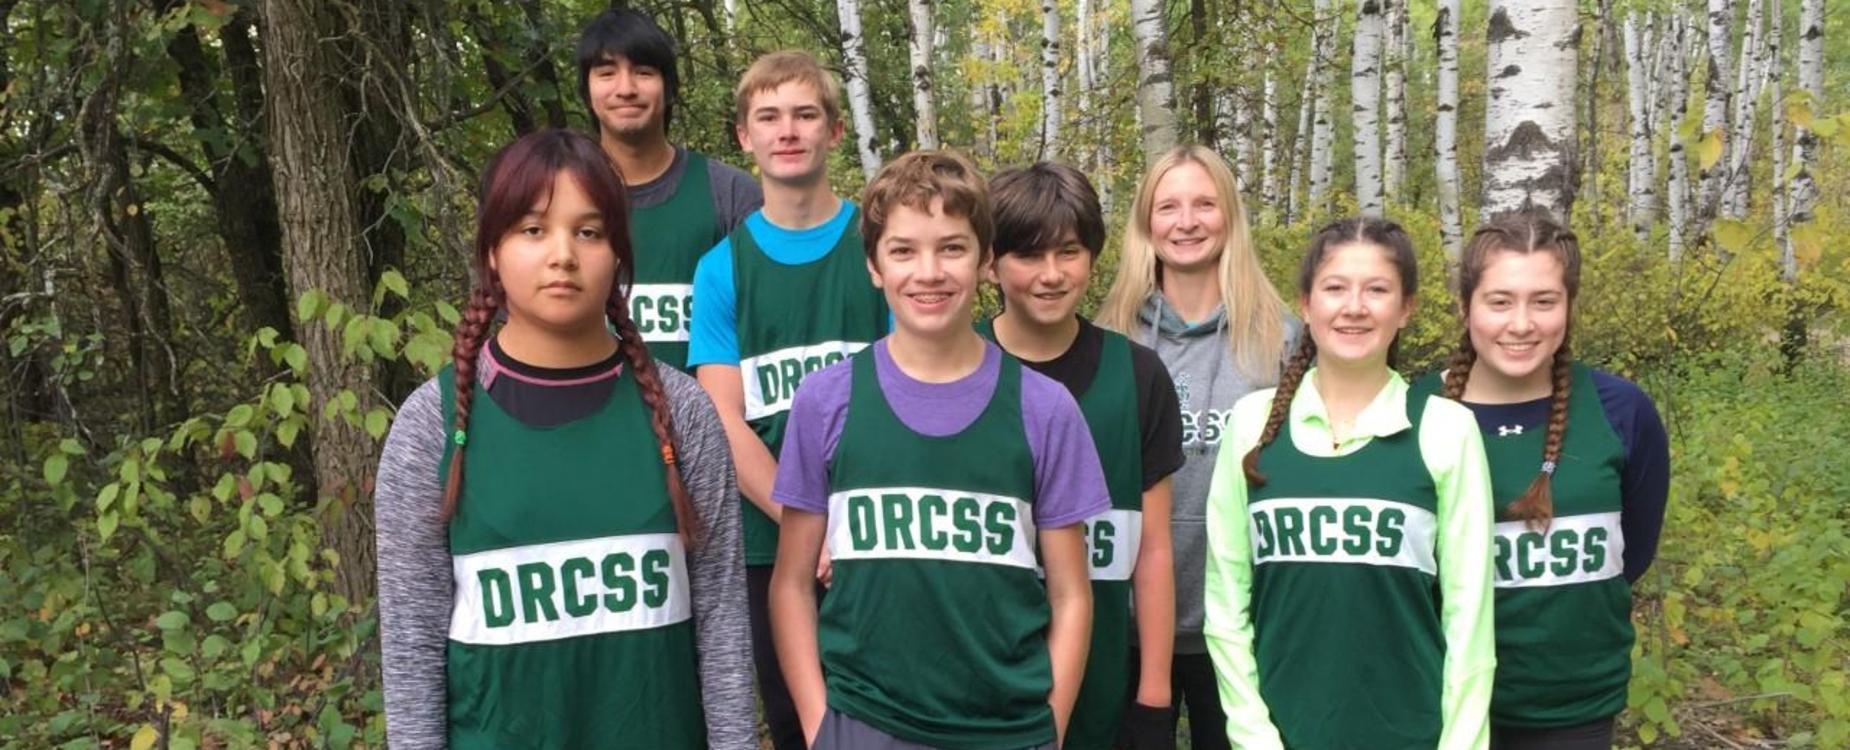 cross country running team